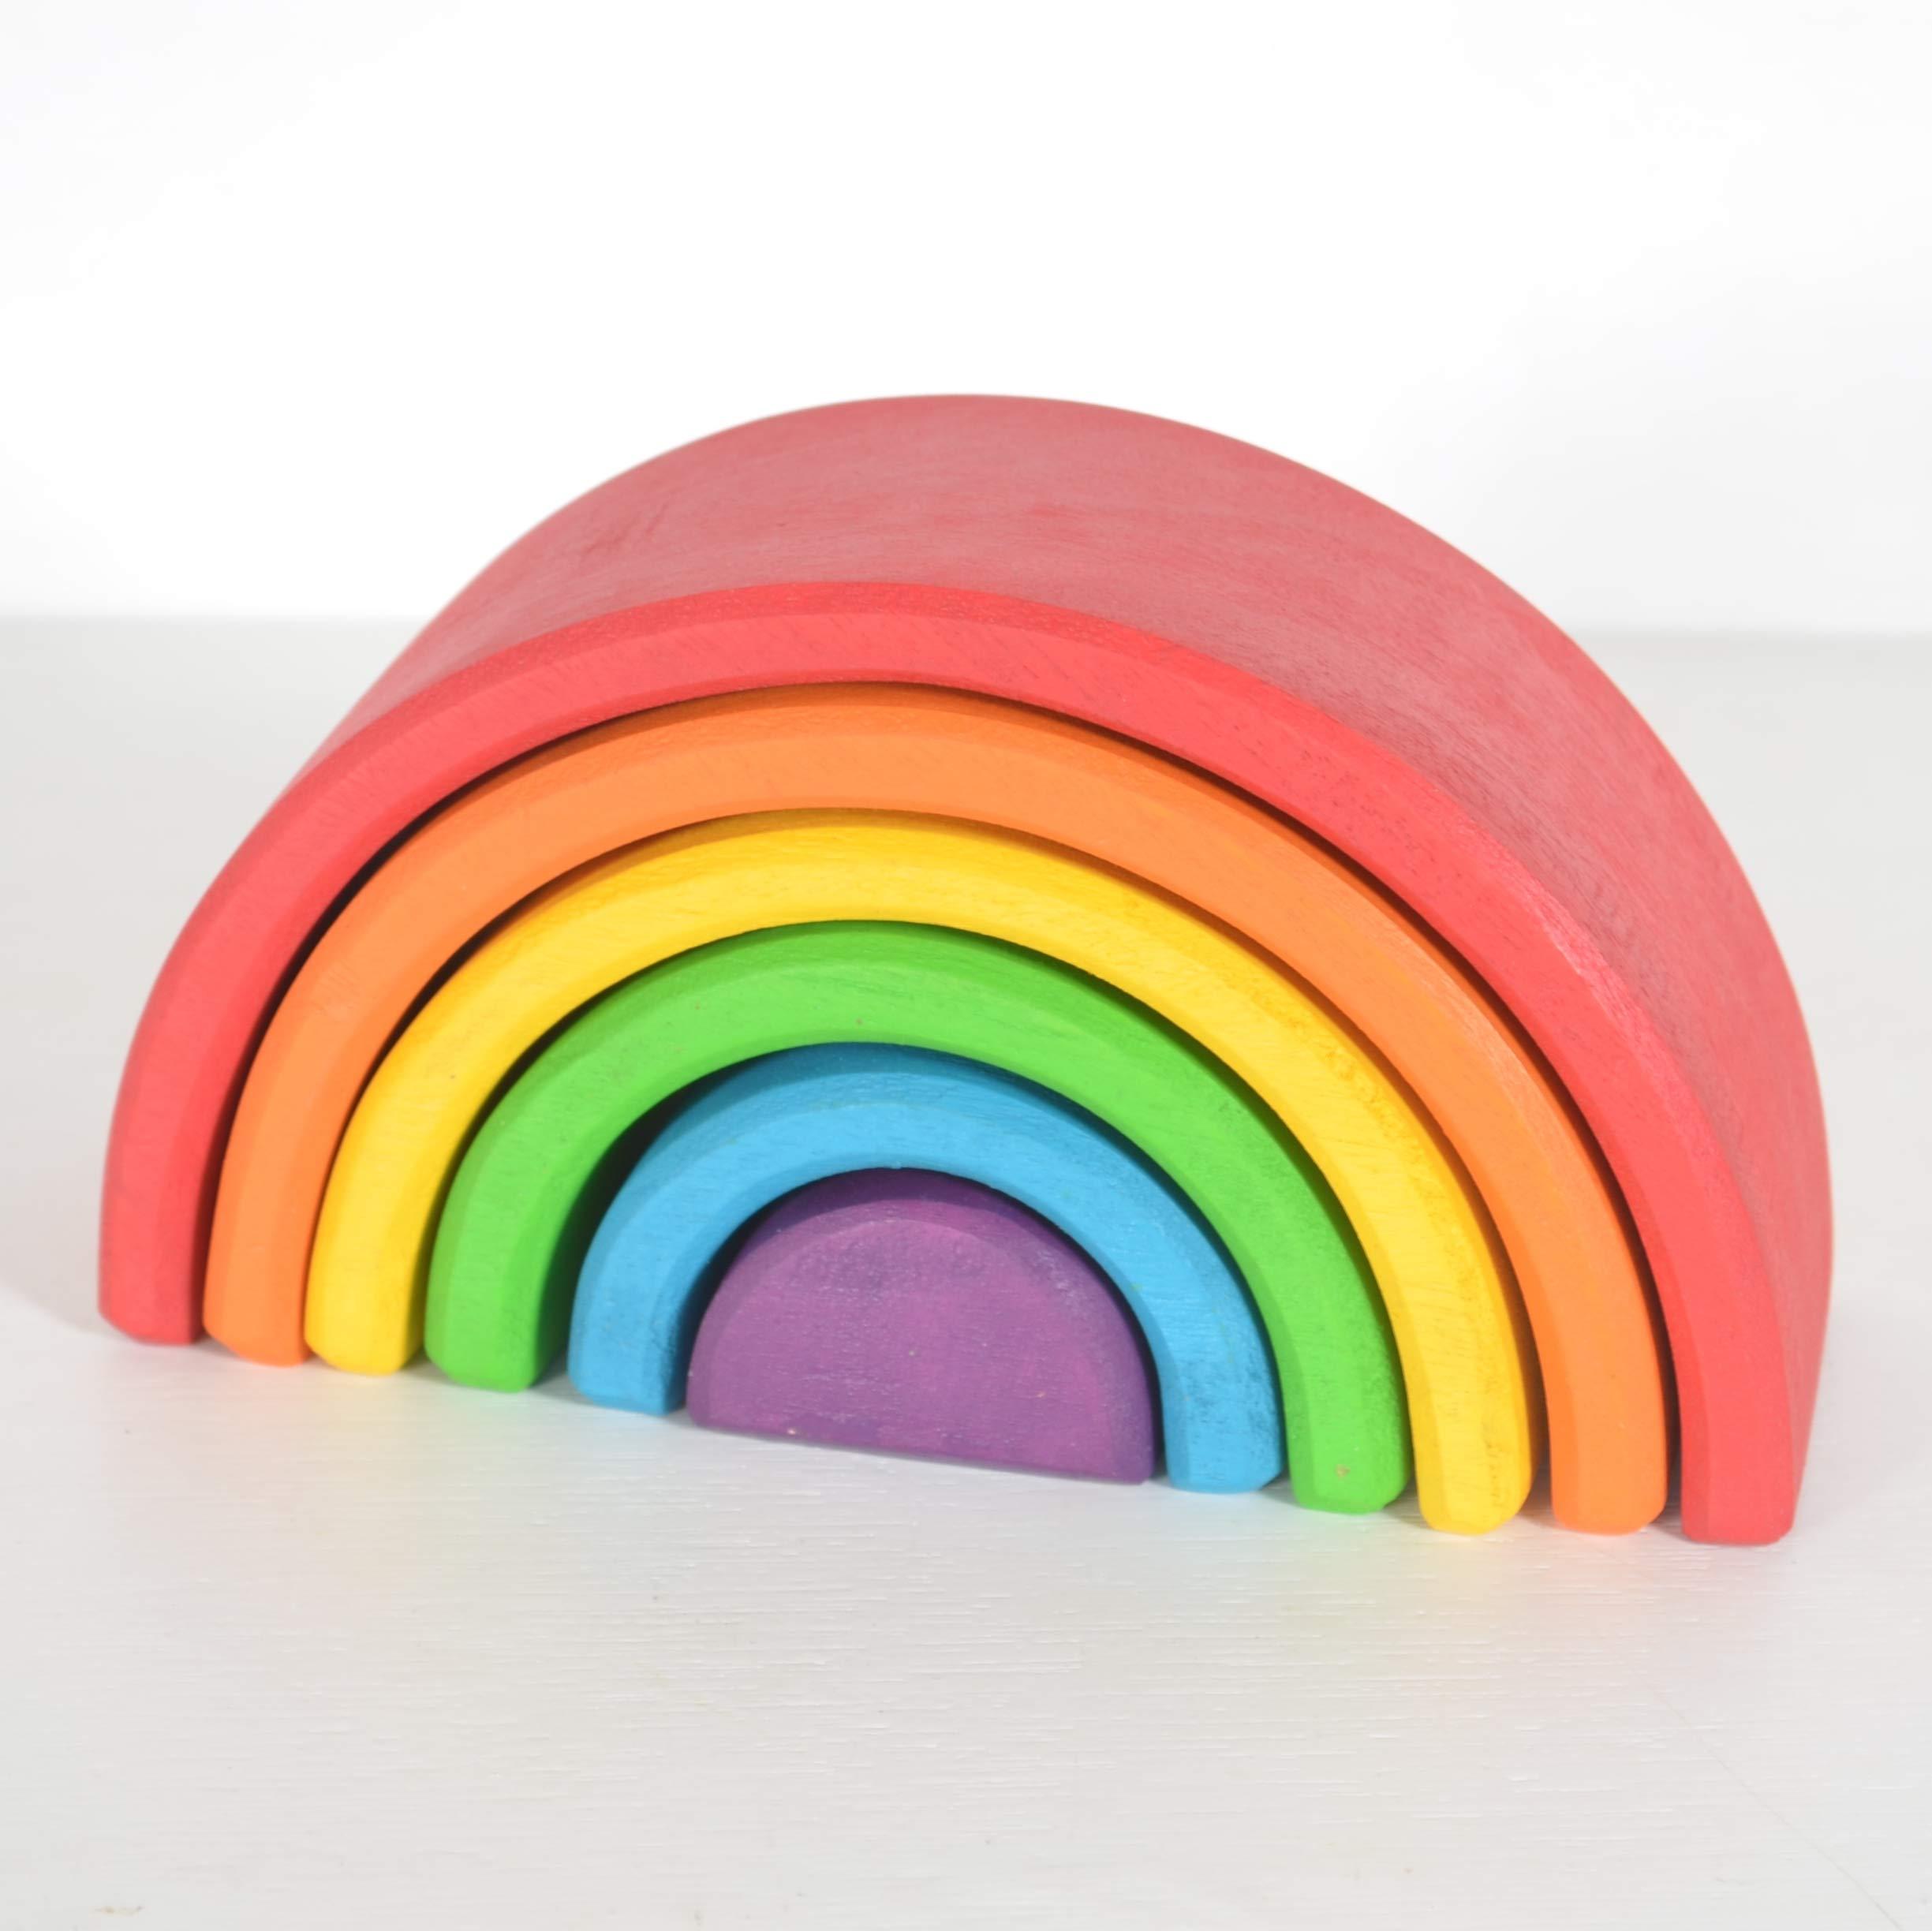 Chitrani 6-Piece Large Rainbow Stacker - Nesting Wooden Waldorf Blocks, Elements of Nature